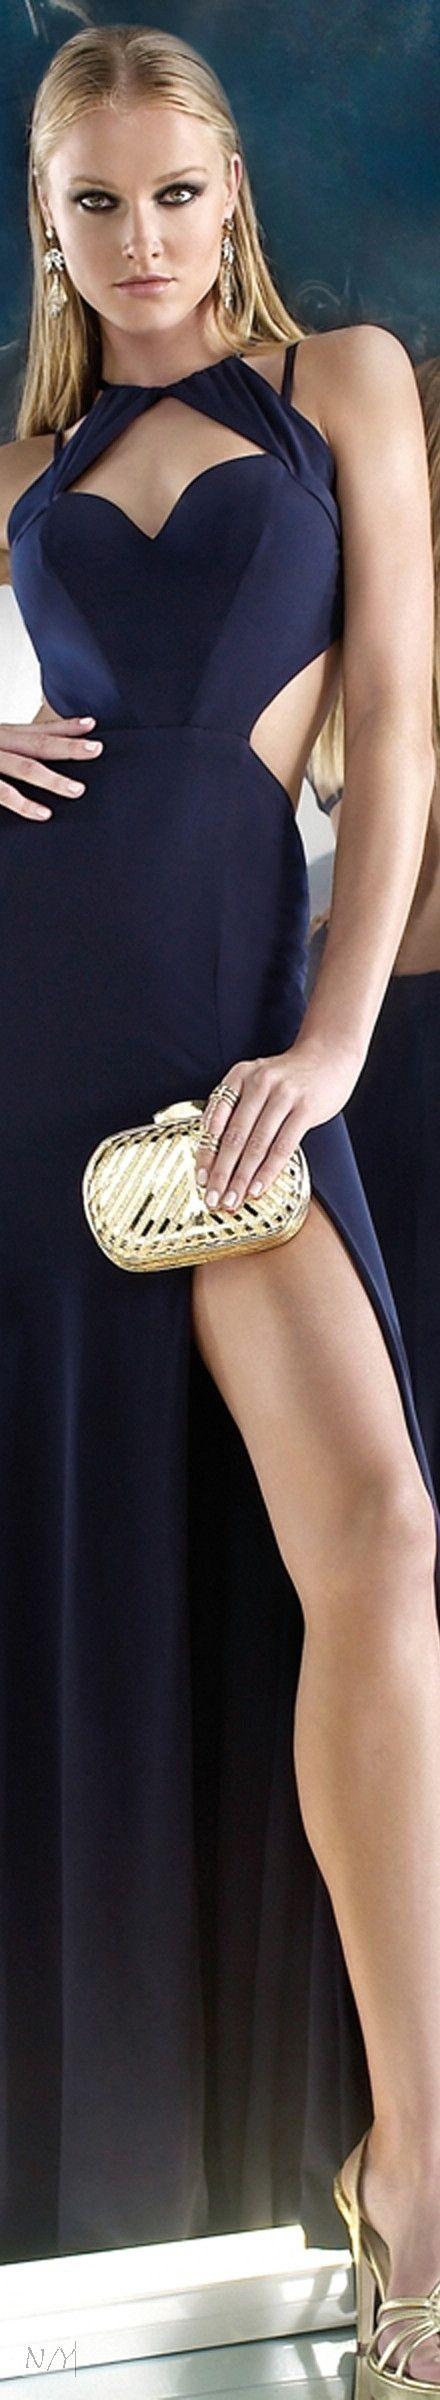 Alyce Paris 2016 - Fashion long formal dress